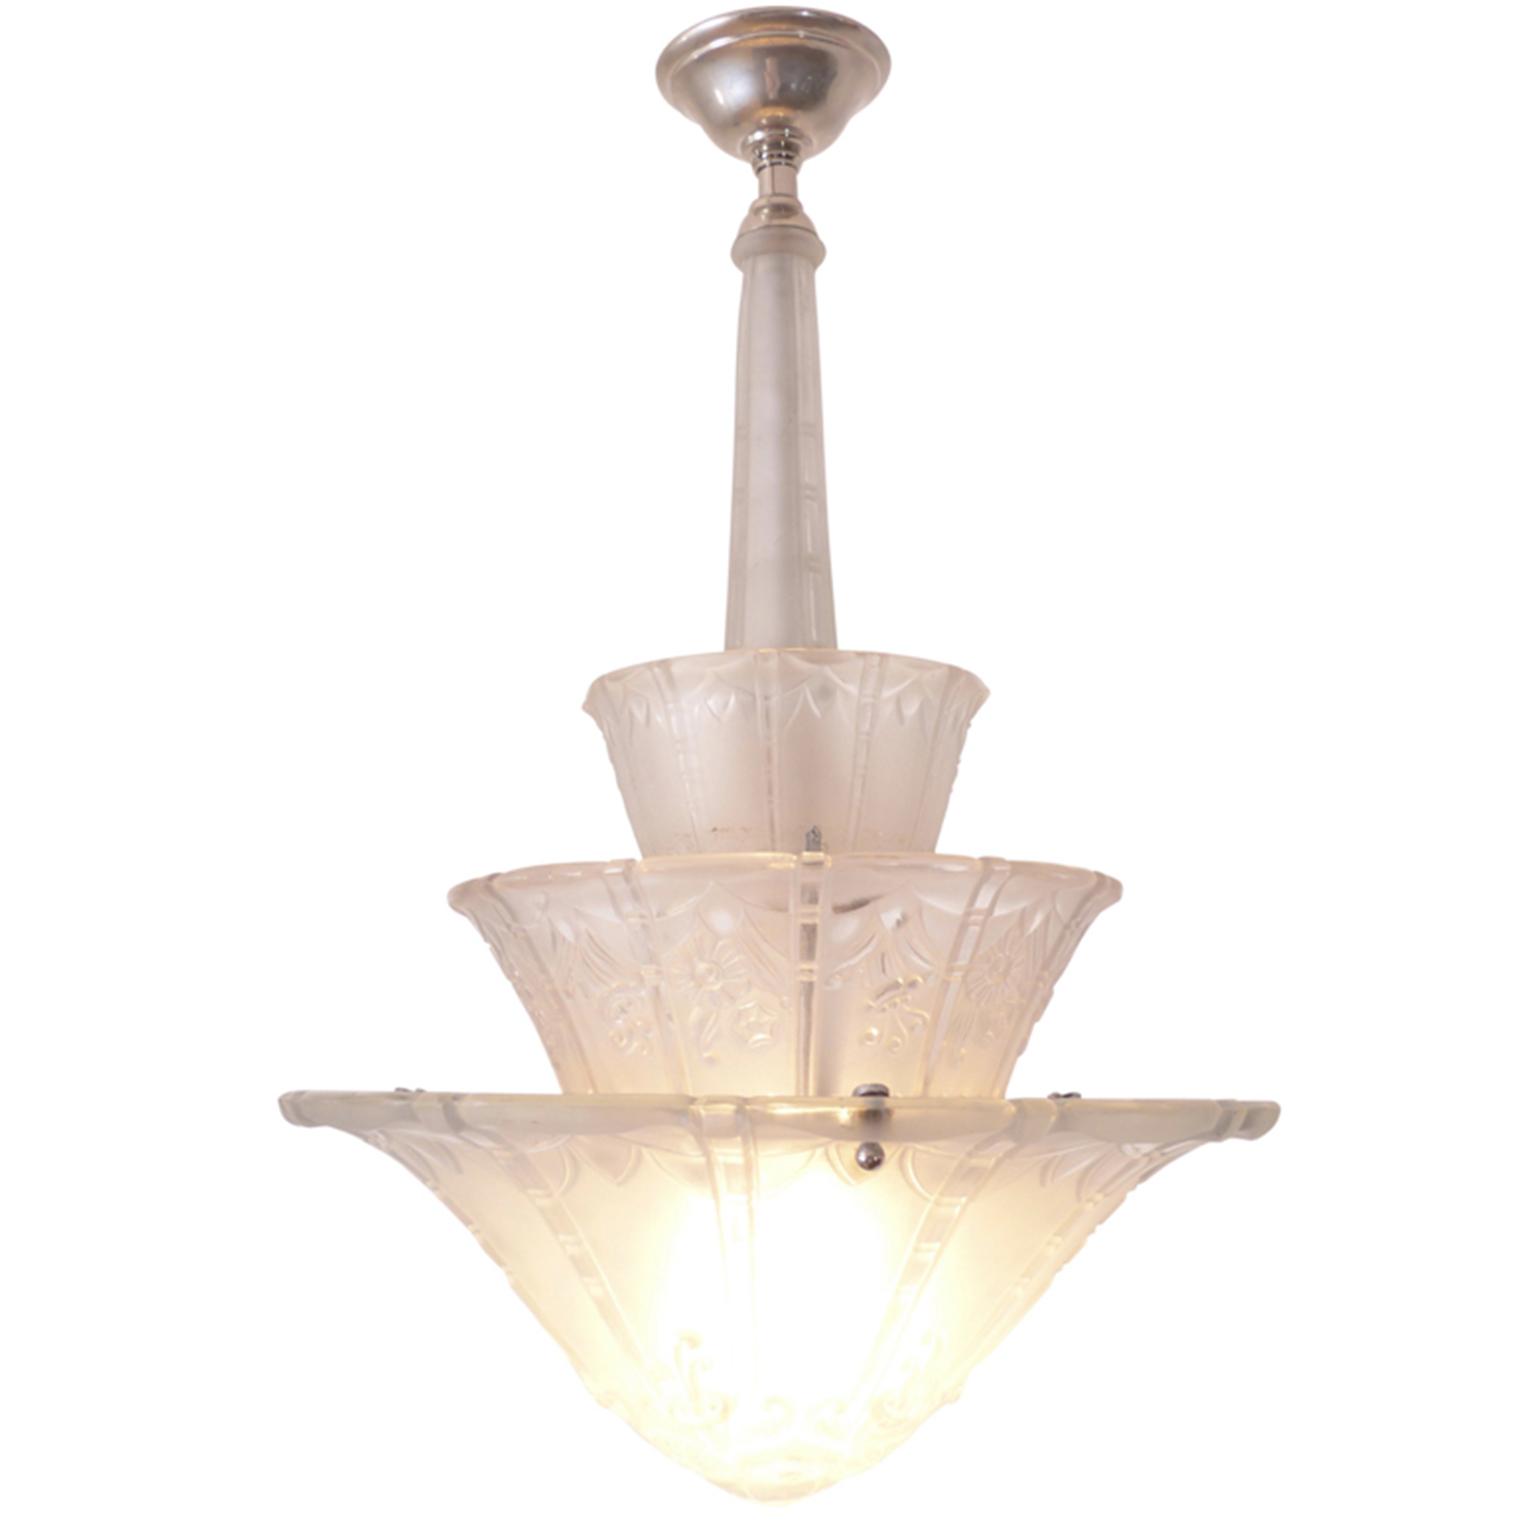 Art Deco Opaline Glass chandelier with nickel hardware.